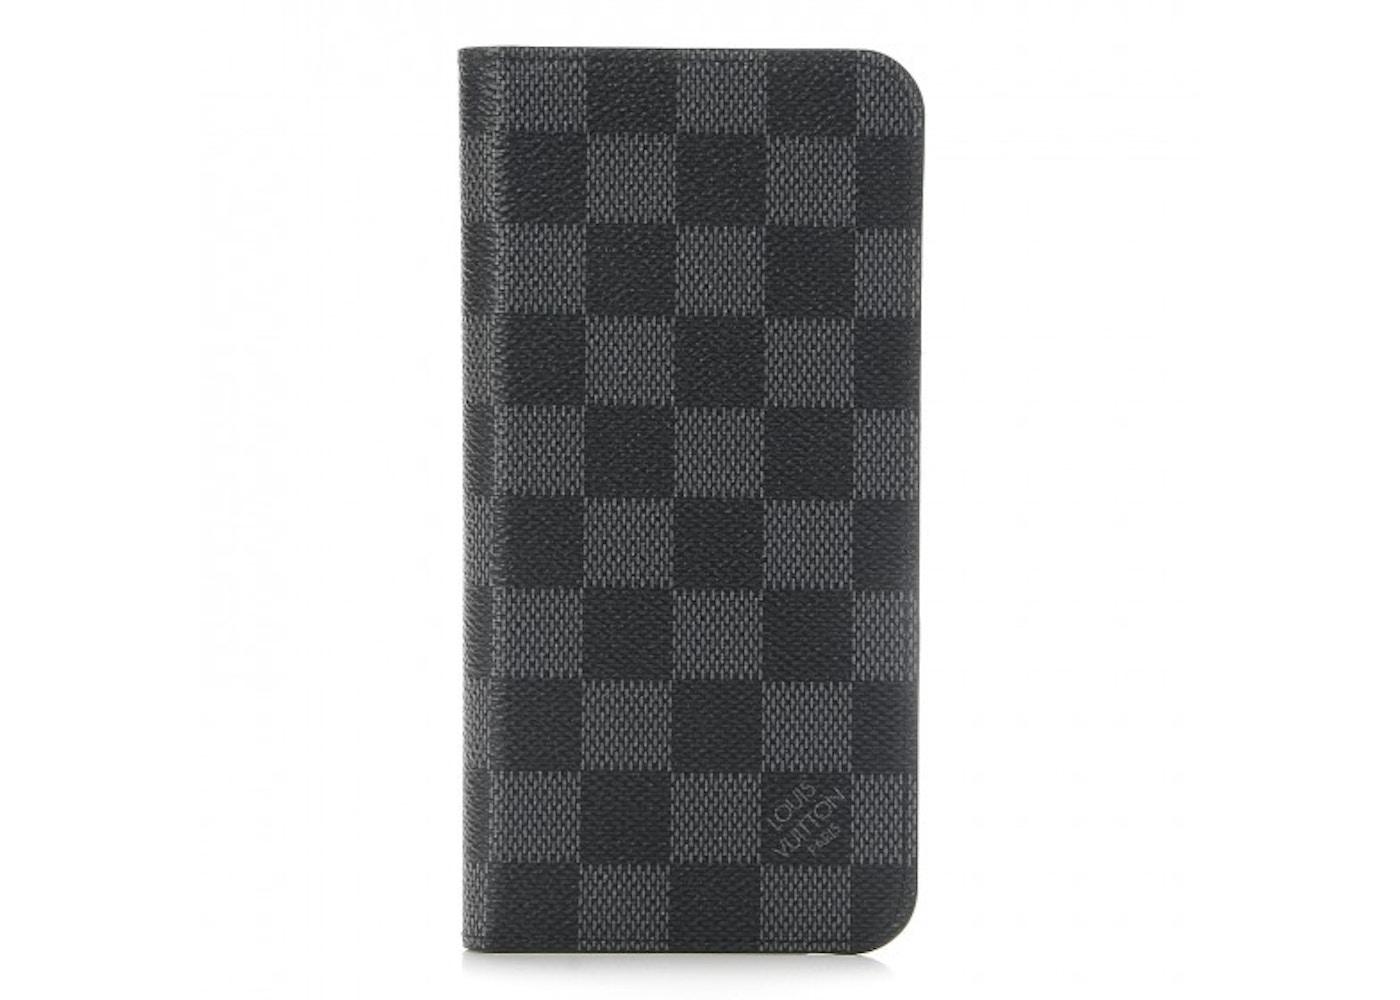 9a7ec2546c Louis Vuitton Folio Case iPhone 7/8 Plus Damier Graphite Black/Grey